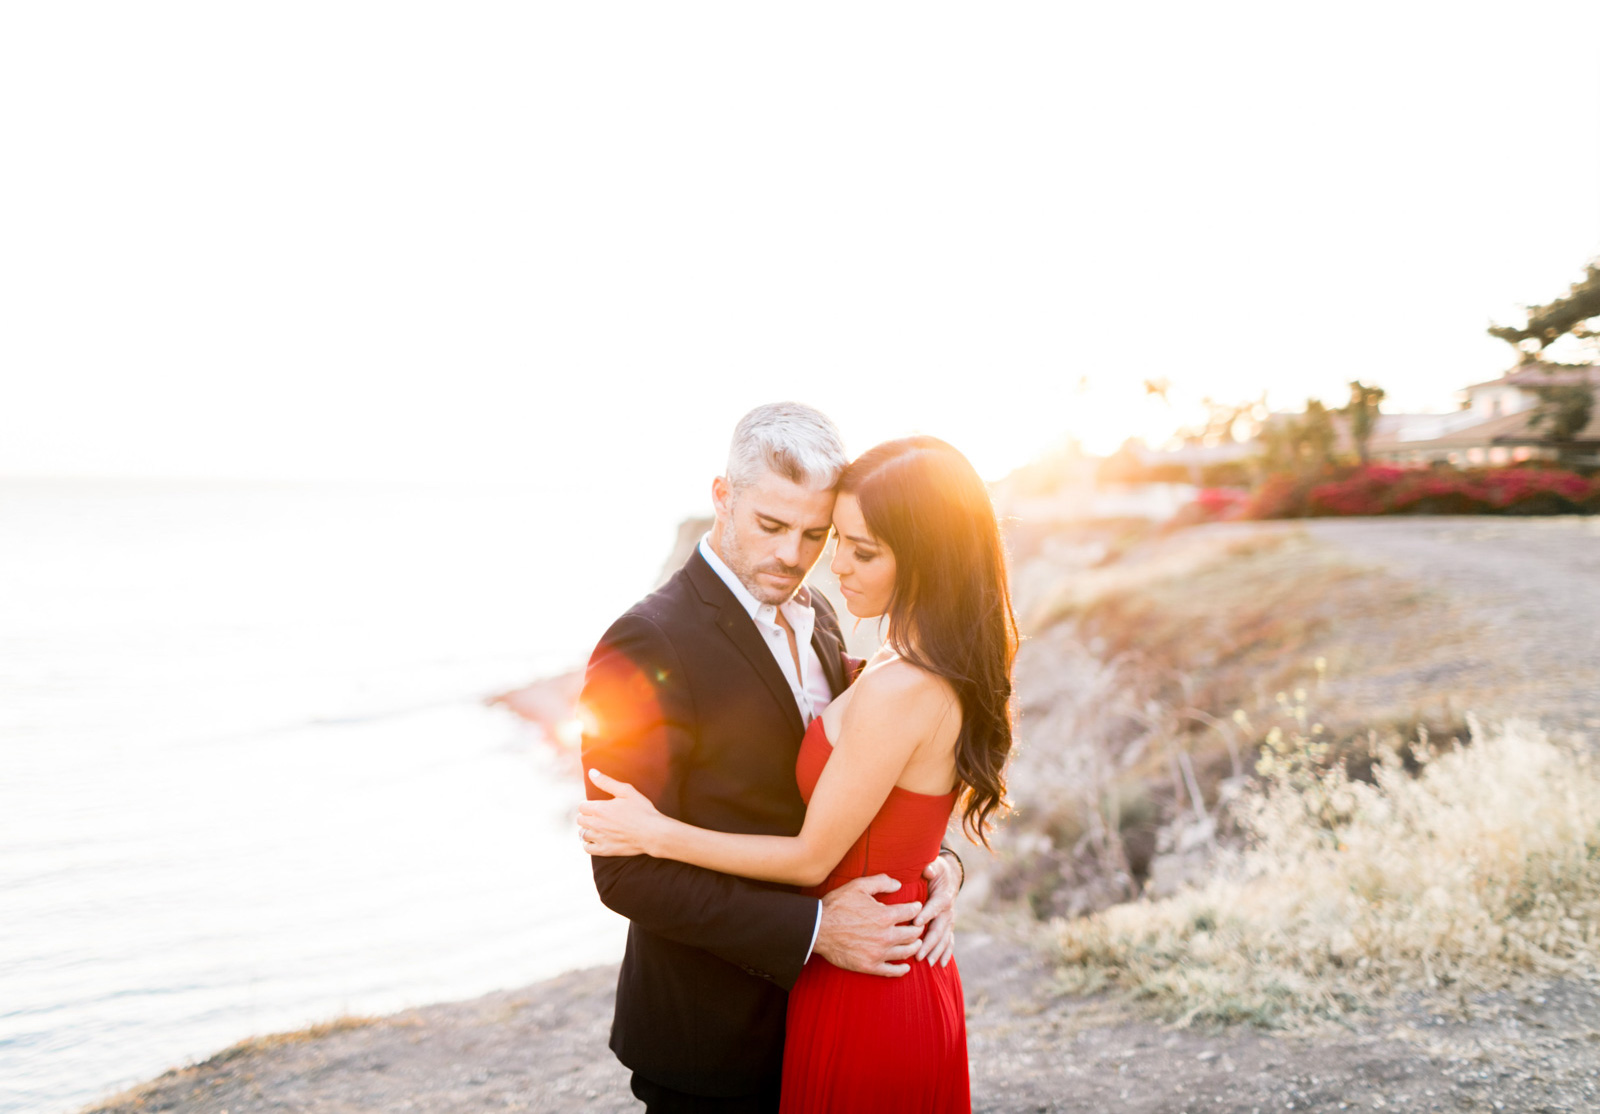 San-Luis-Obispo-Wedding-Photographer-Natalie-Schutt-Photography_01.jpg